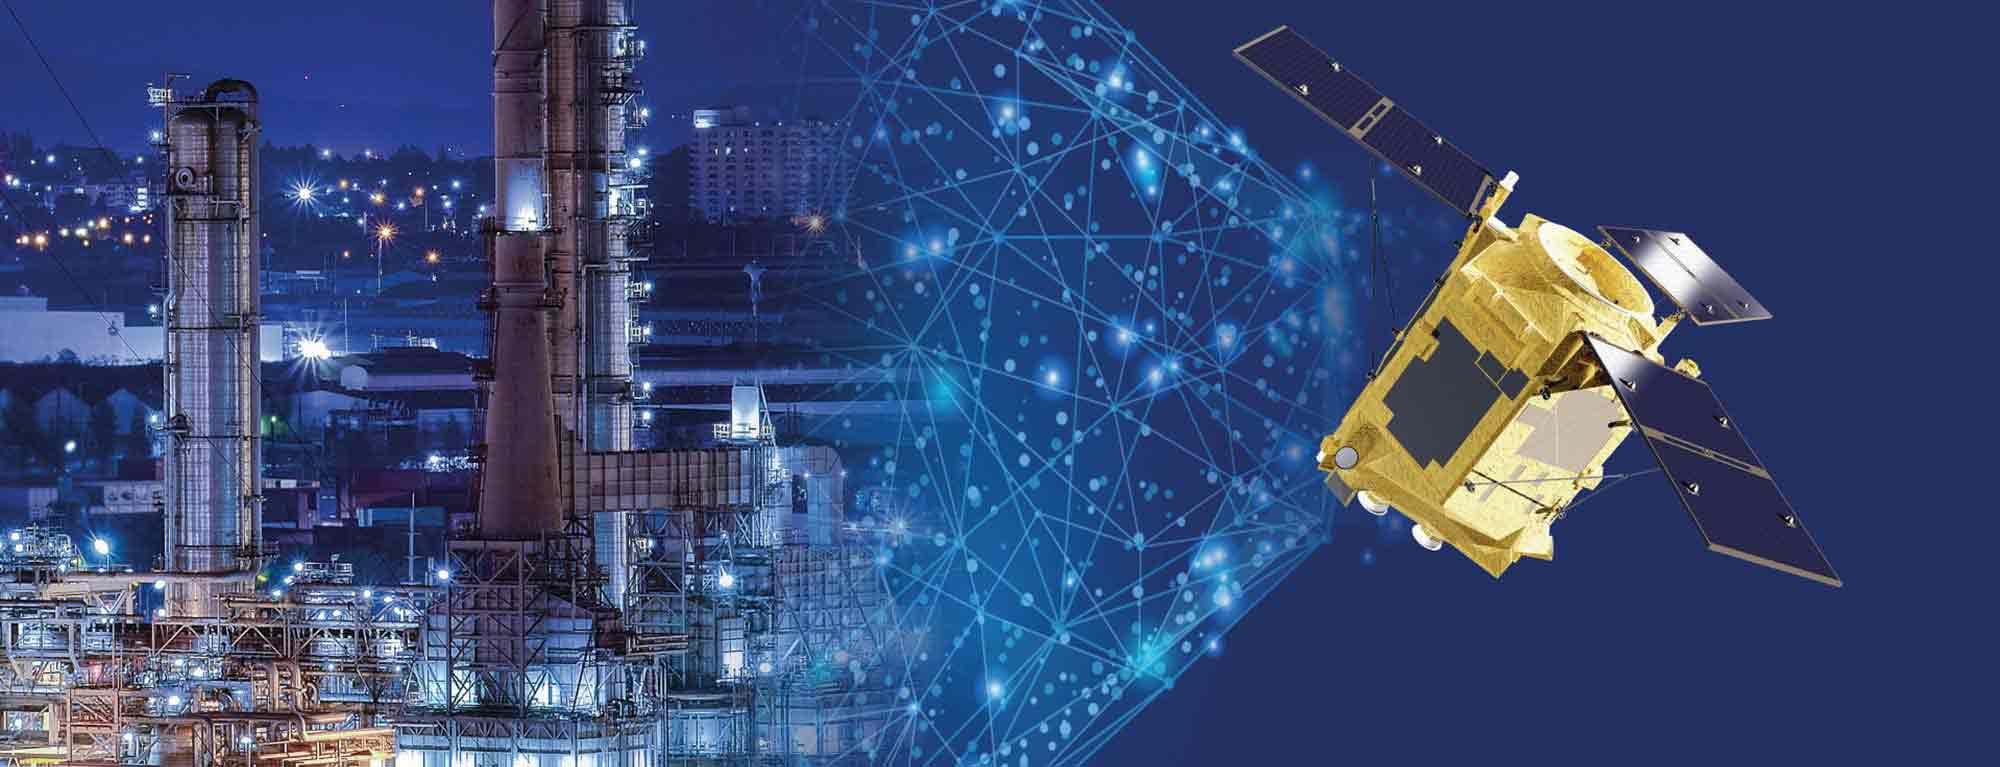 Monitoring refinery insights for shutdown prediction